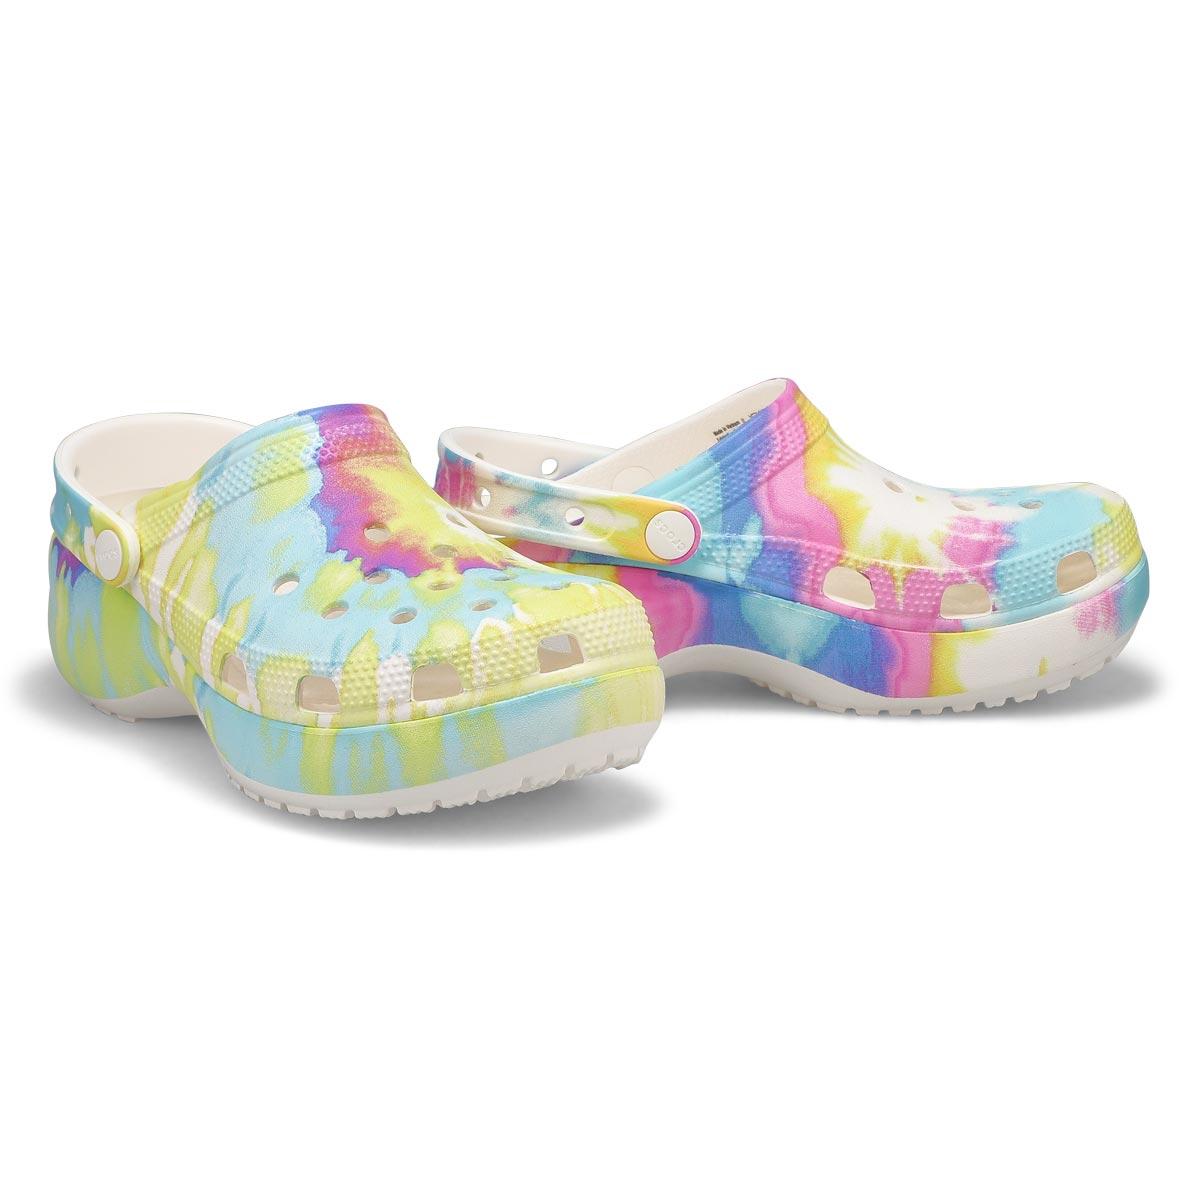 Women's Classic Platform EVA Clog - Tie Dye